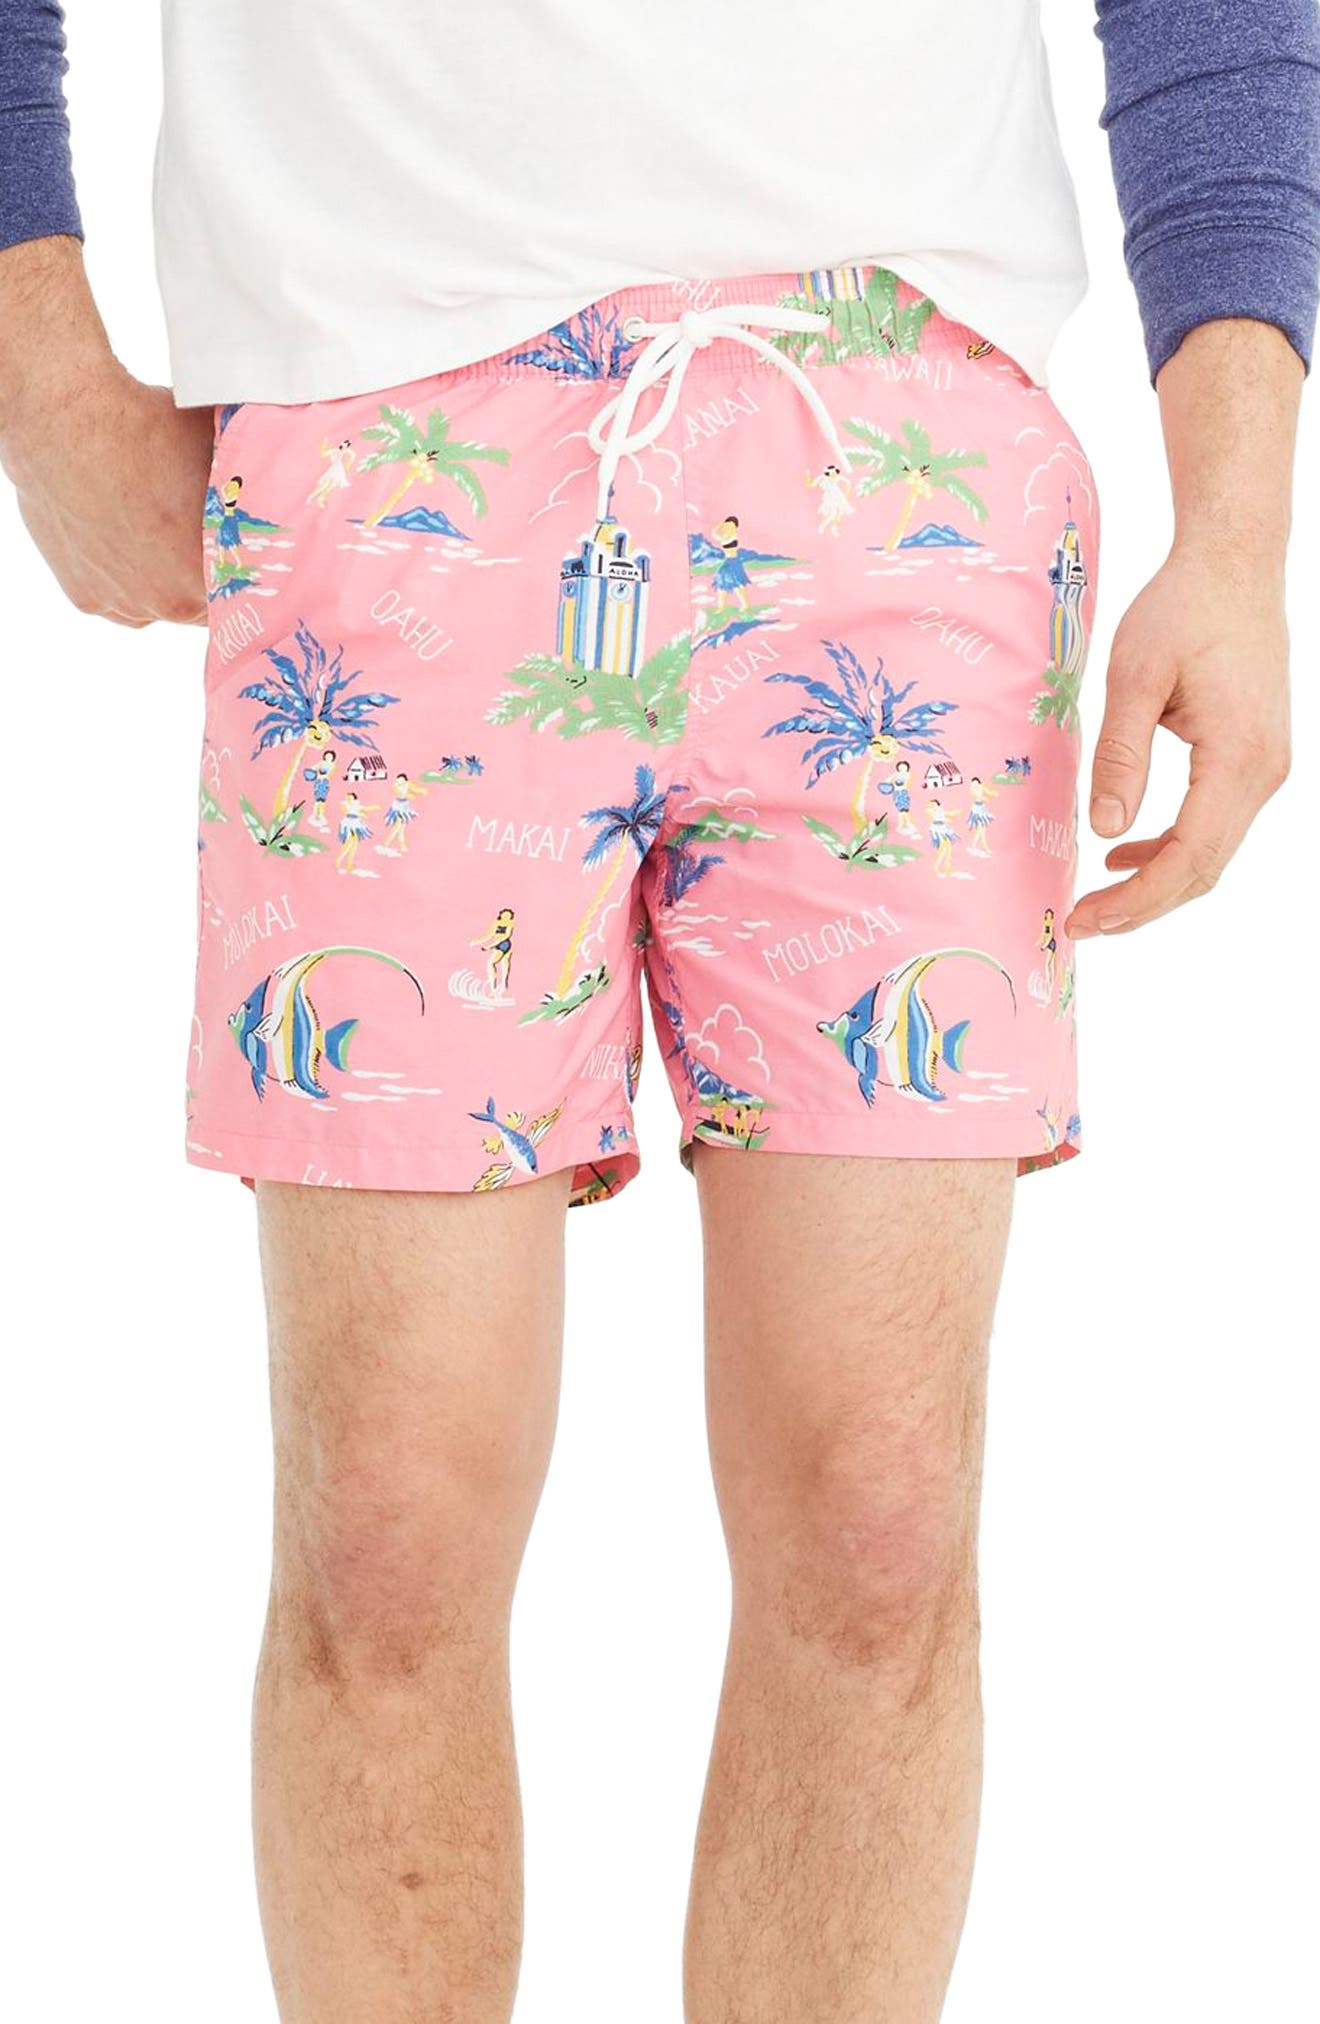 J.Crew Hawaii Print Swim Trunks,                         Main,                         color, Pink Seas